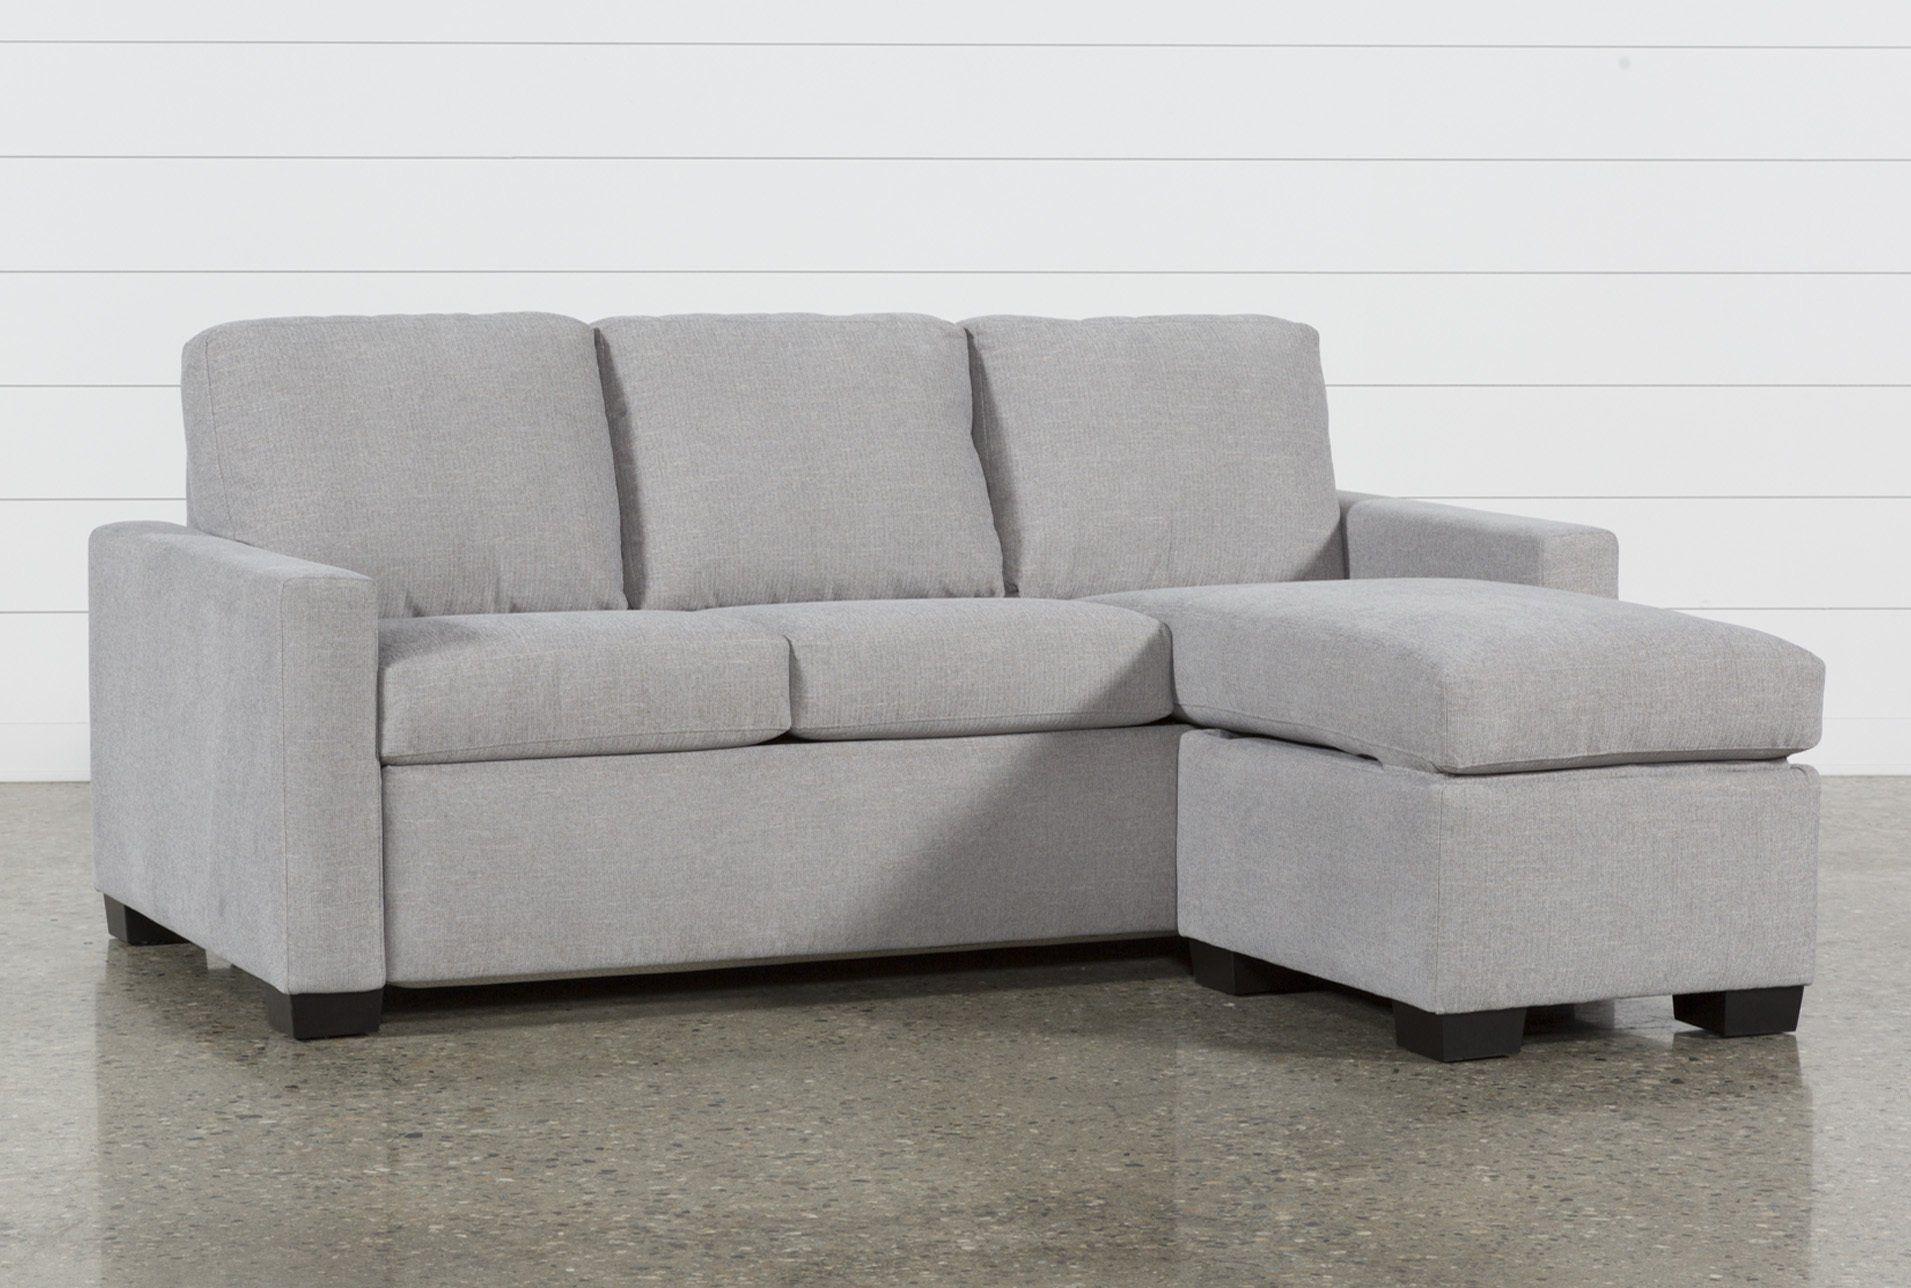 Sofa Sleeper With Storage Chaise